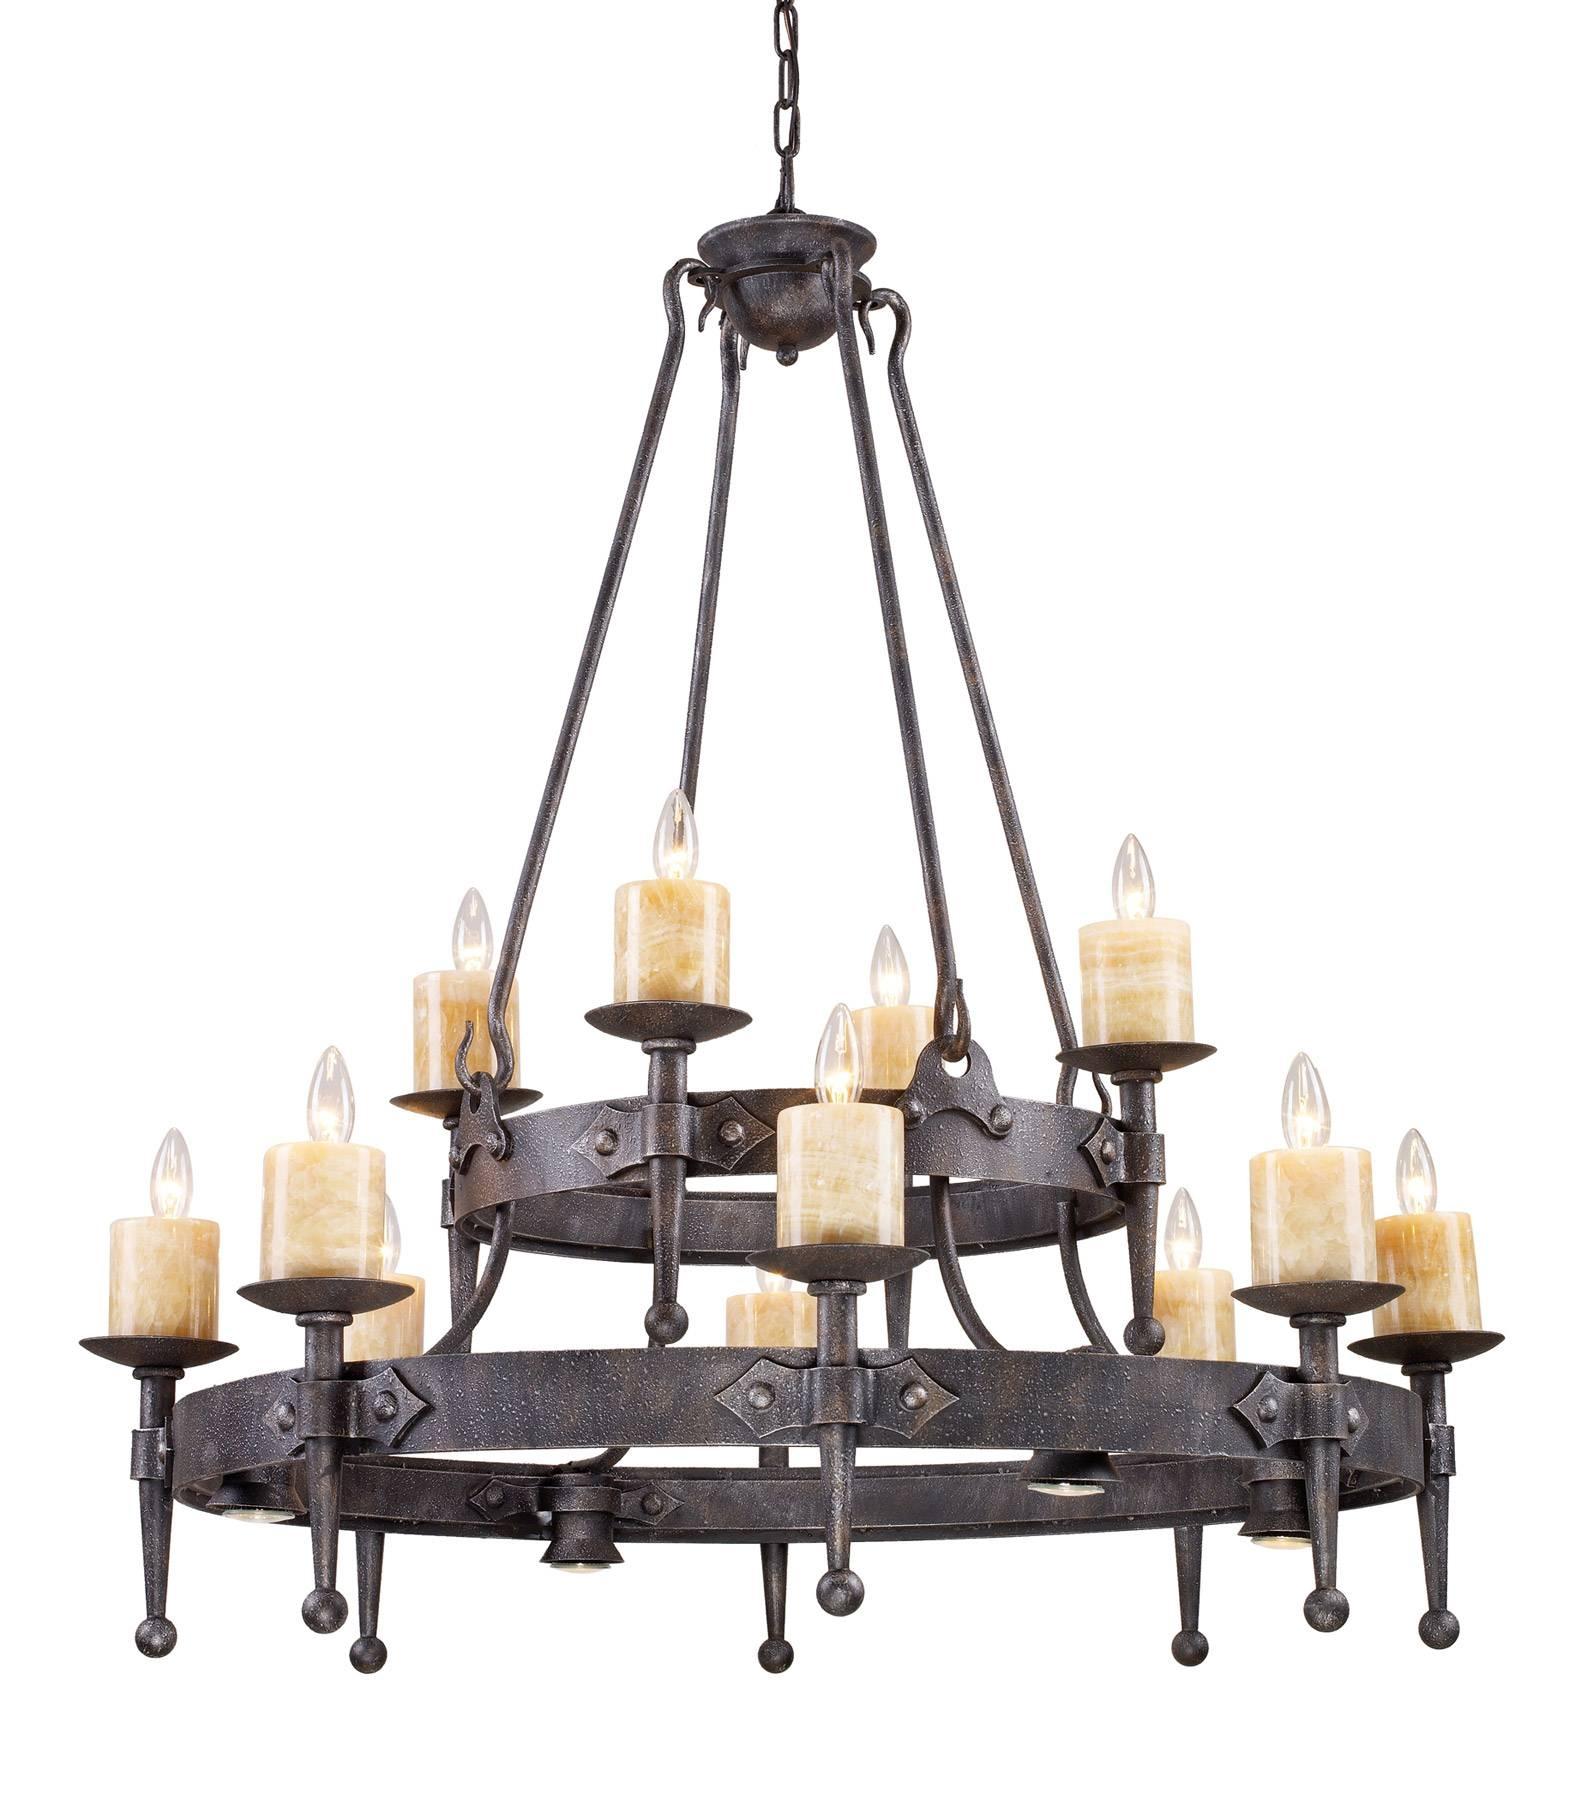 Wrought Iron Chandeliers Australia Design – Home Furniture Ideas inside Wrought Iron Pendant Lights Australia (Image 12 of 15)